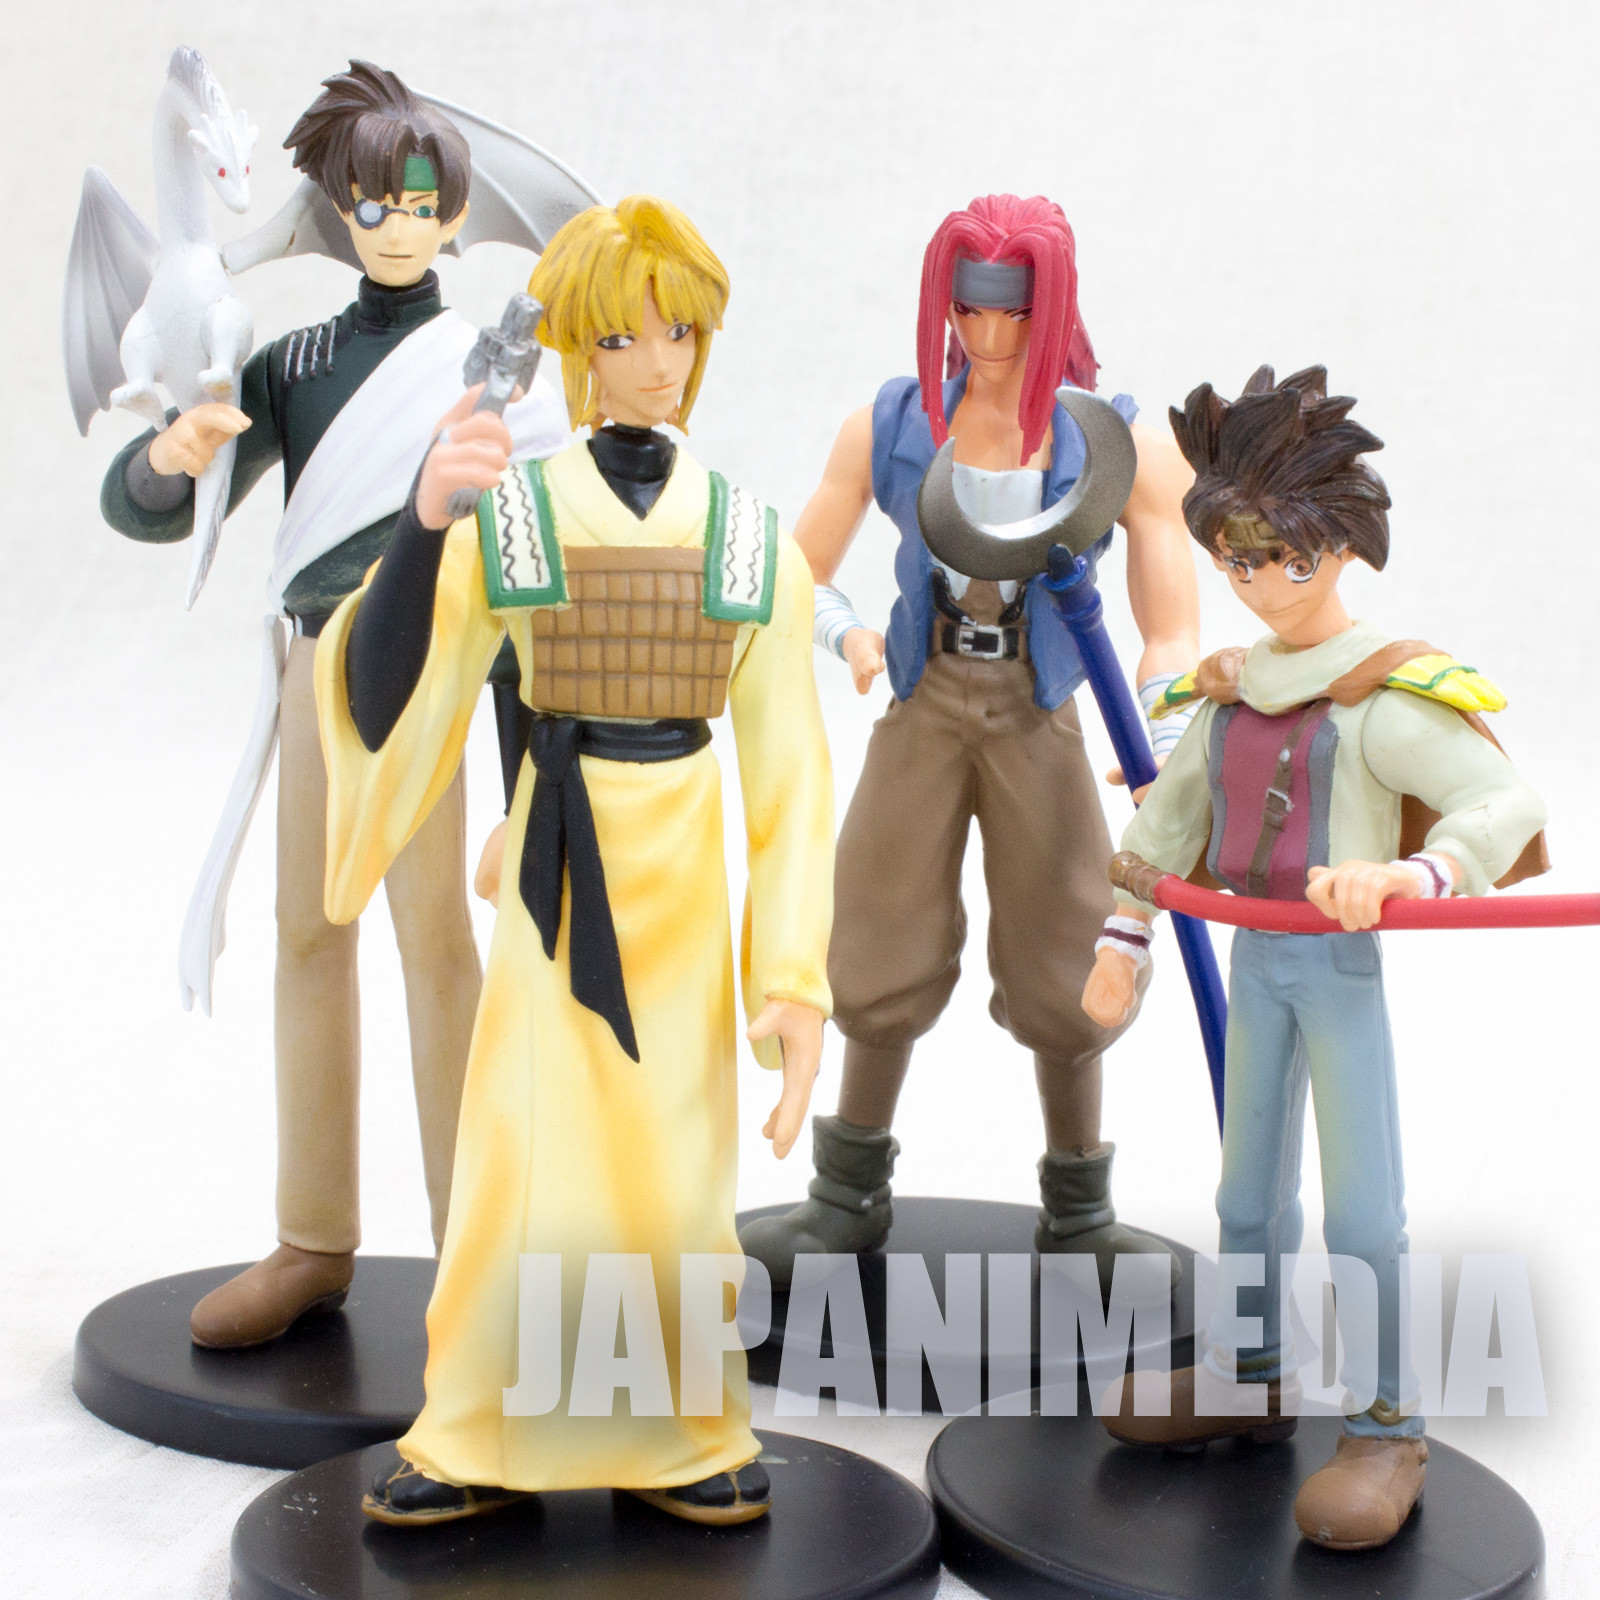 Gensomaden SAIYUKI Trading Figure 4pc Repaint ver. Set [Sanzo / Goku / Gojyo / Hakkai] JAPAN